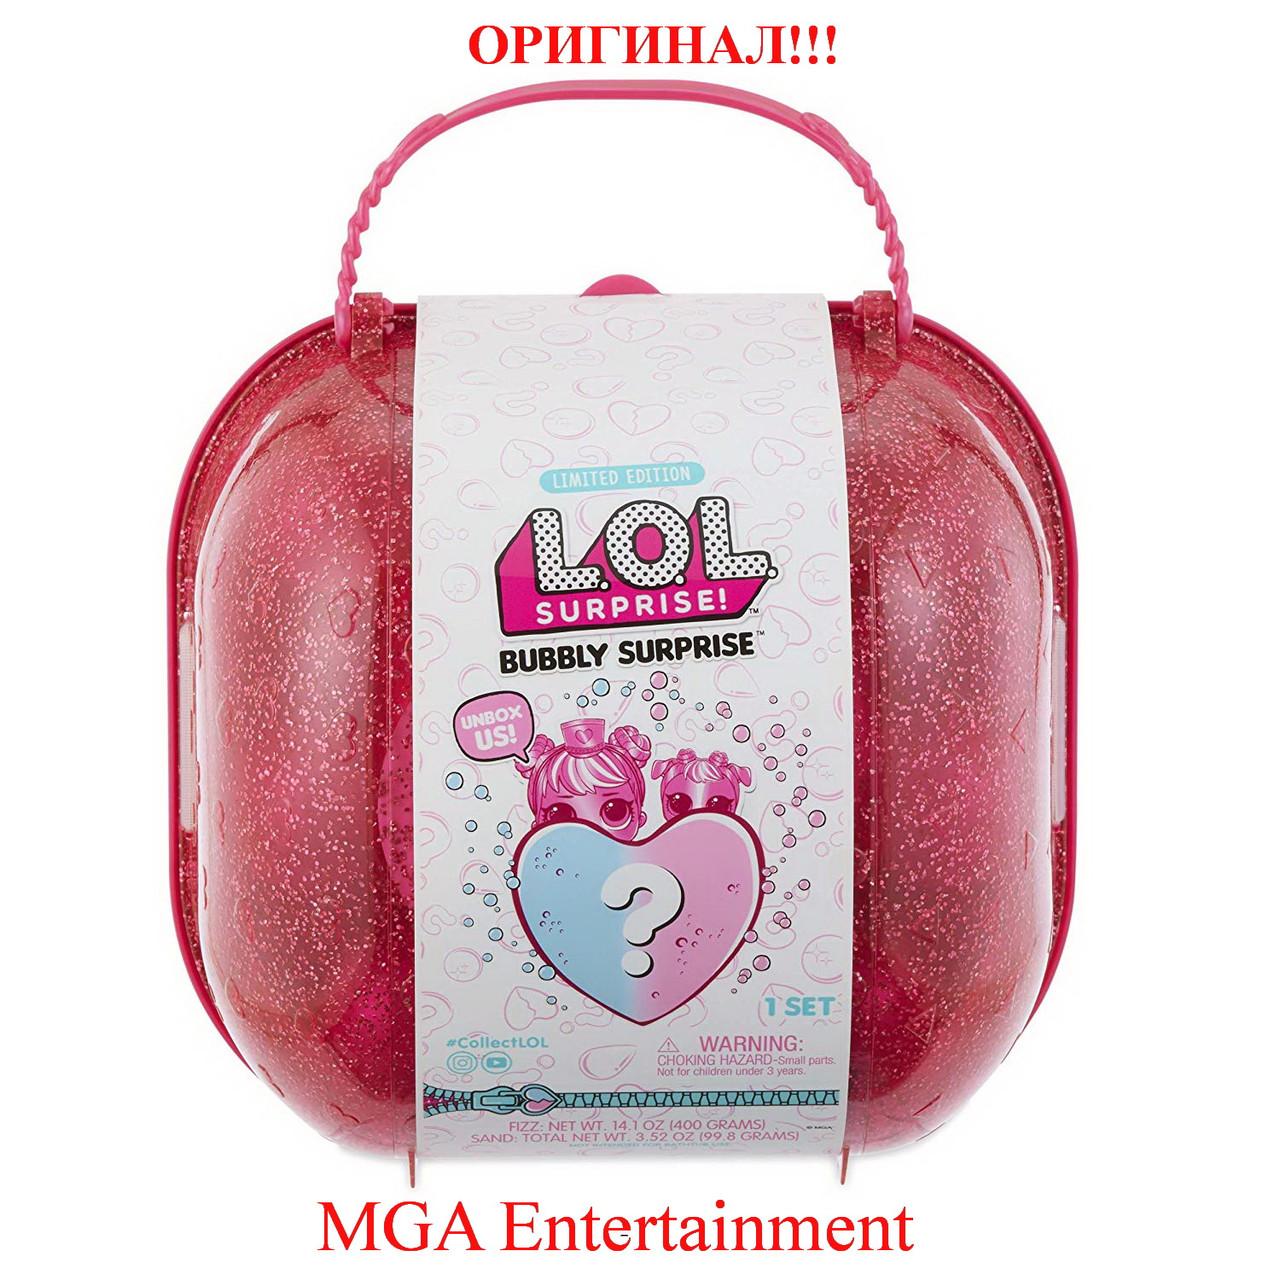 Кукла Лол LOL чемодан Шипучий сюрприз и сердце сюрприз розовый L.O.L. Surprise! Bubbly Surprise Pink